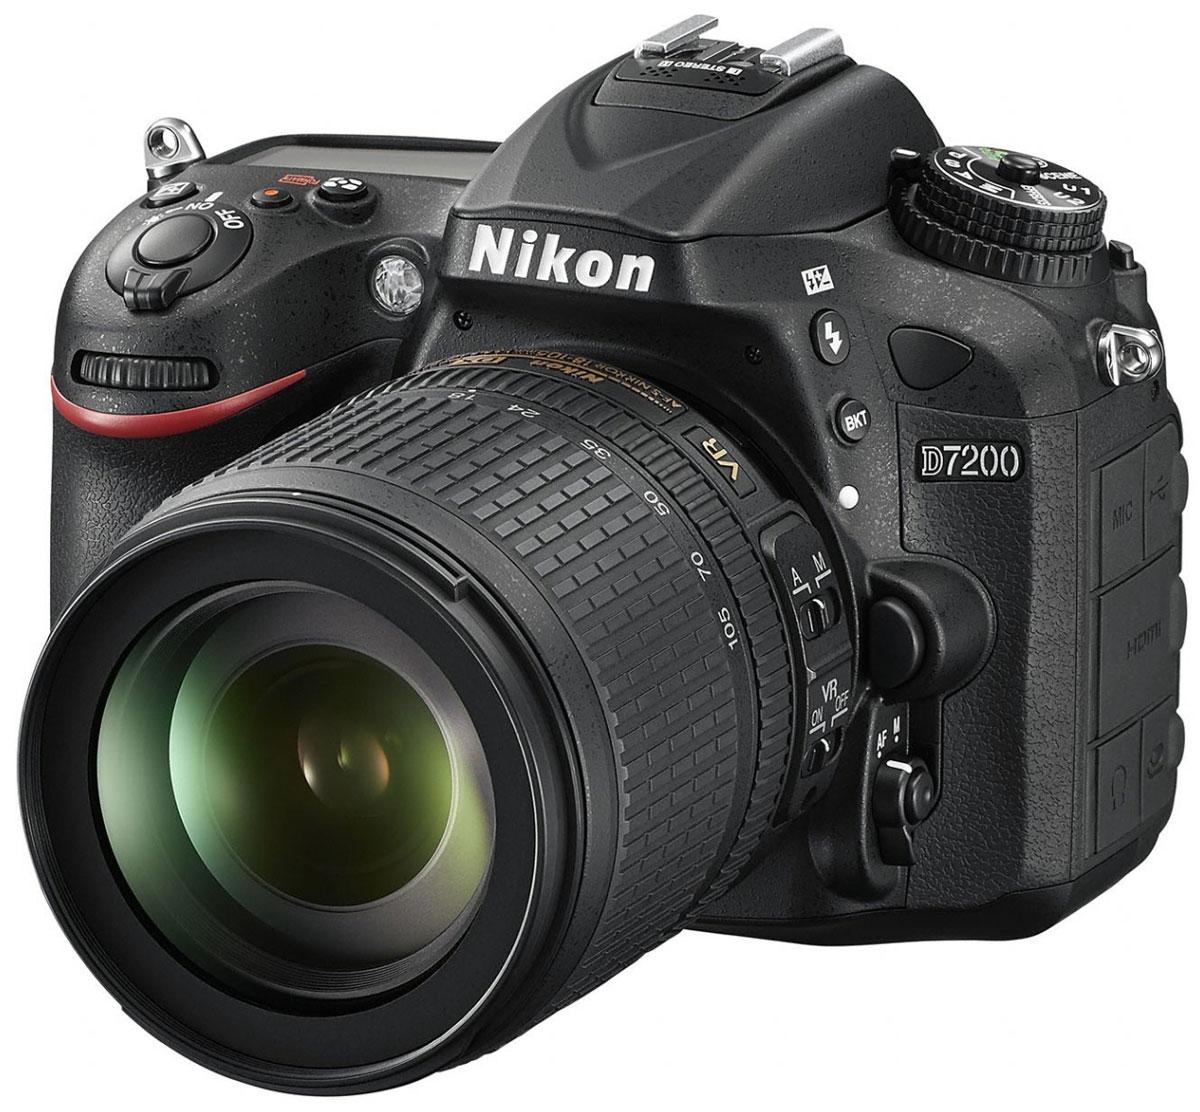 Nikon D7200 Kit 18-105 VR, Black цифровая зеркальная фотокамера VBA450K001